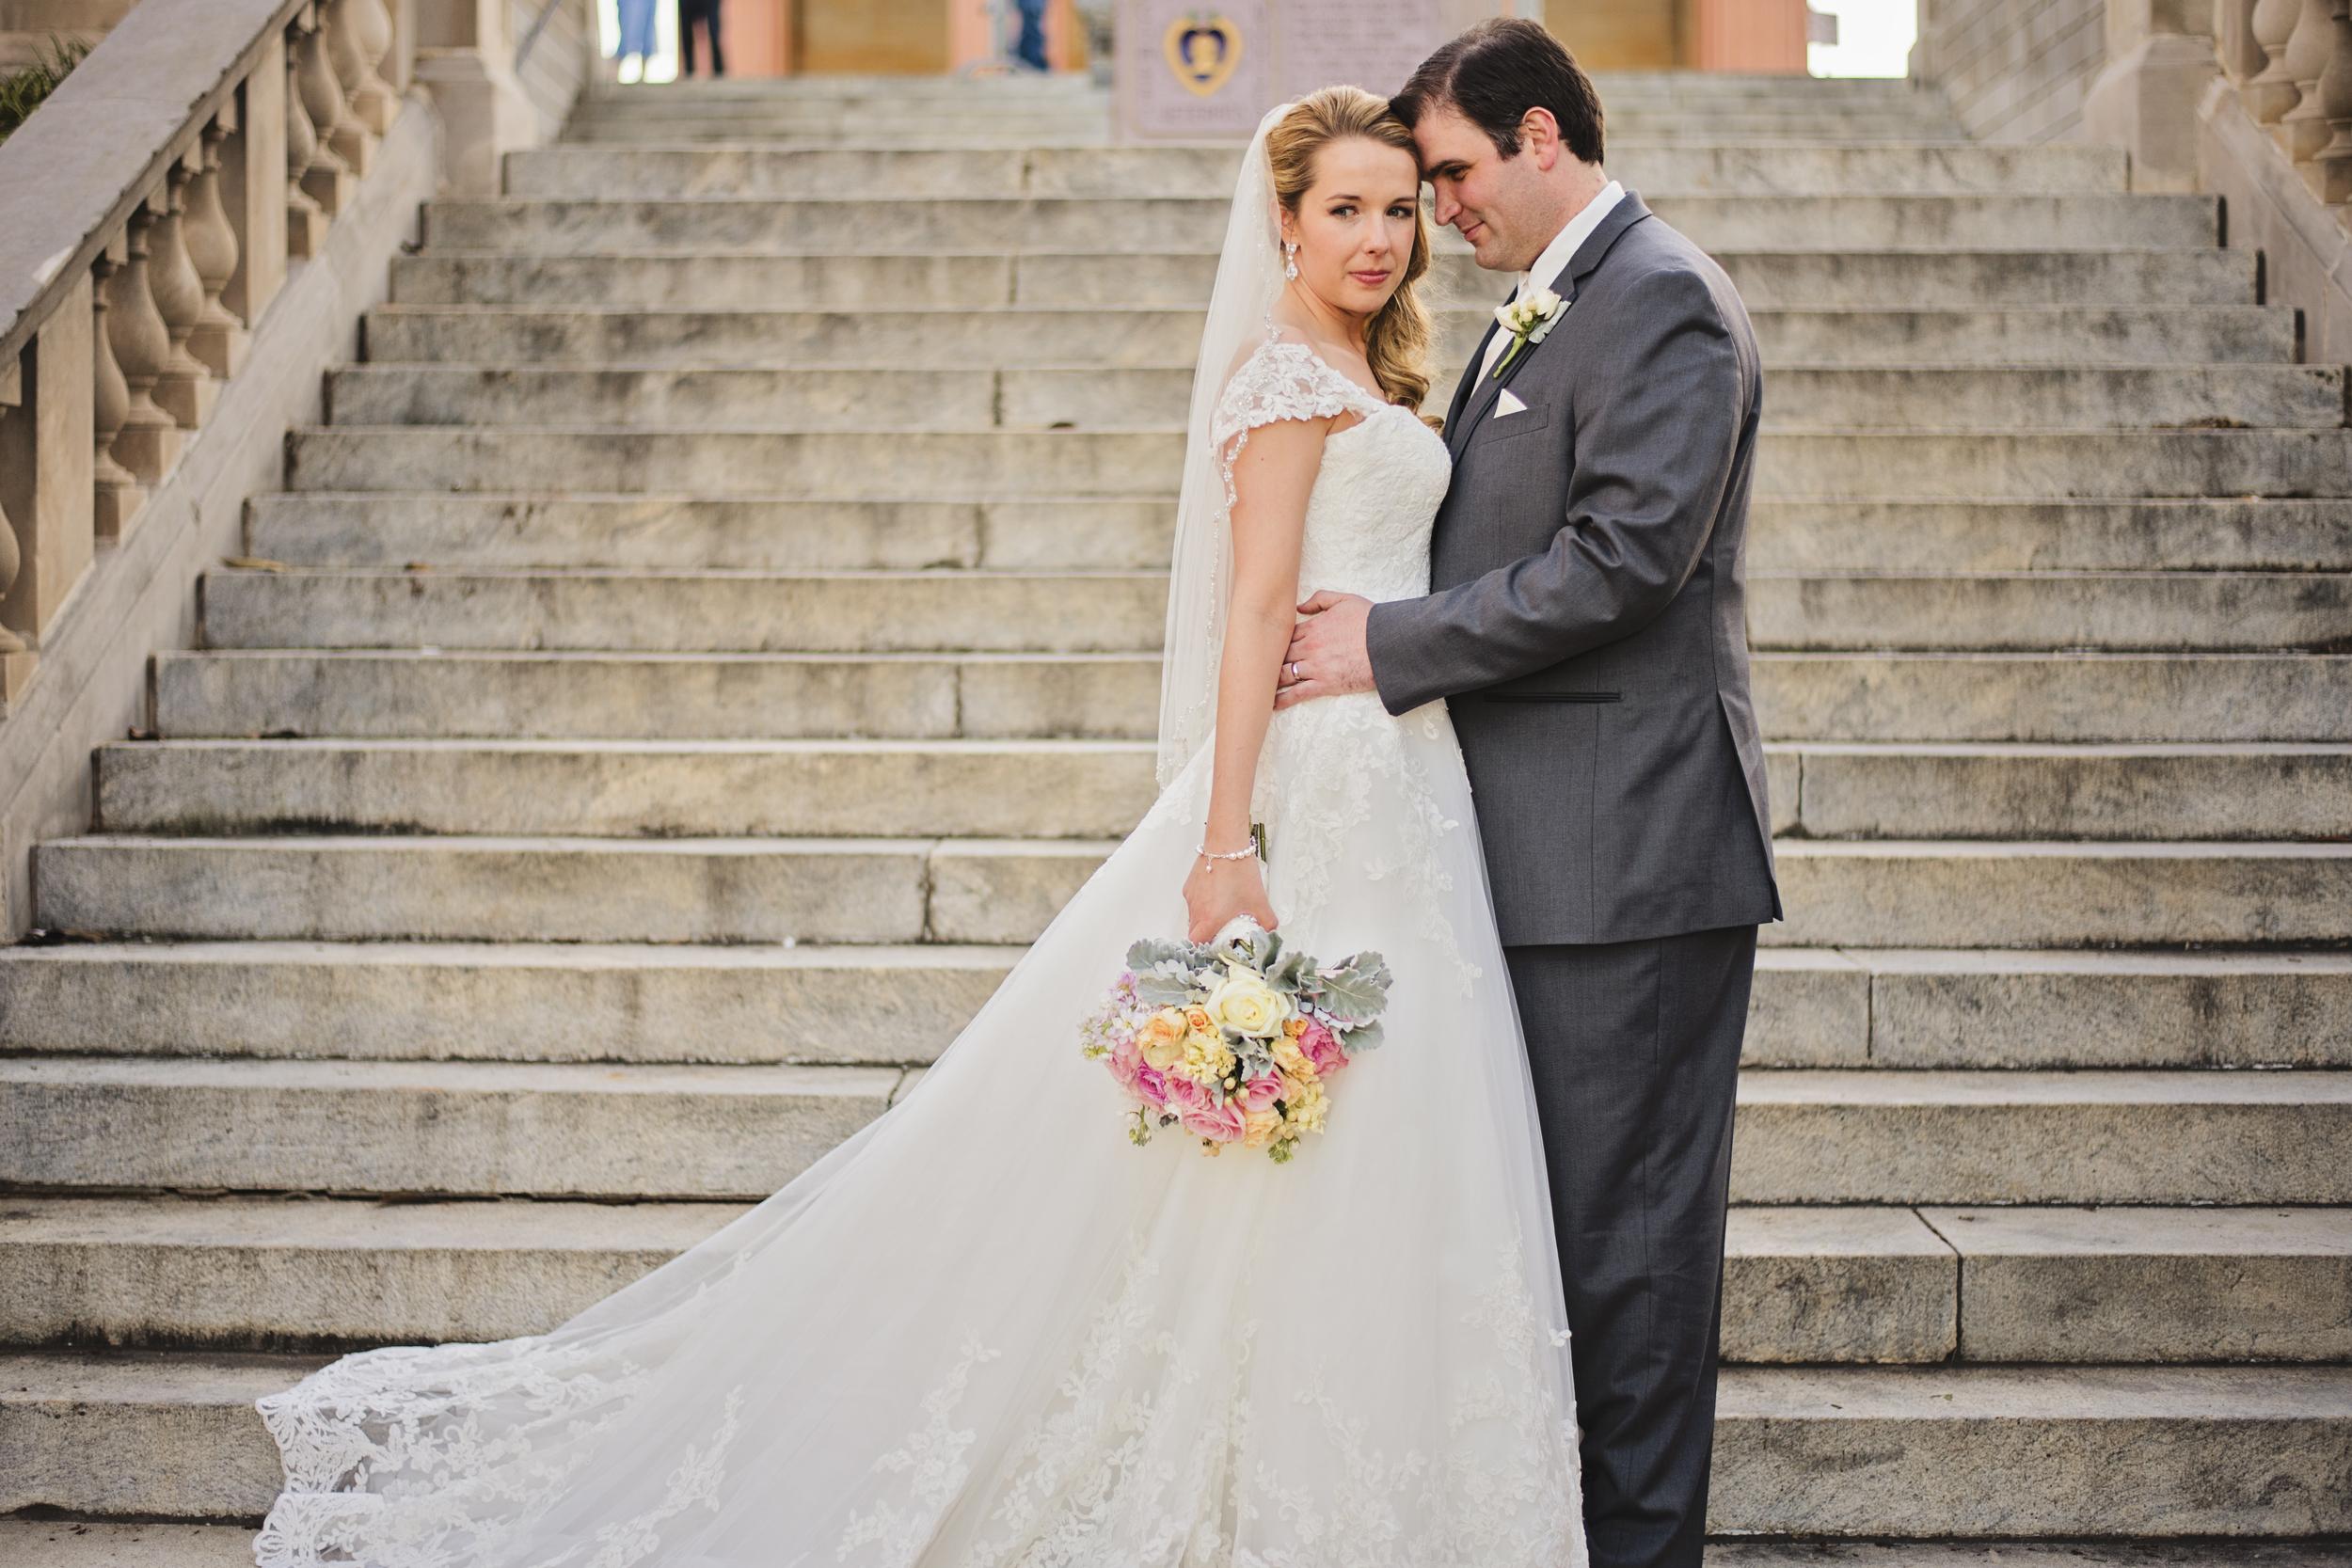 tresca_elegant_downtown_wedding_lynchburg_va028.jpg